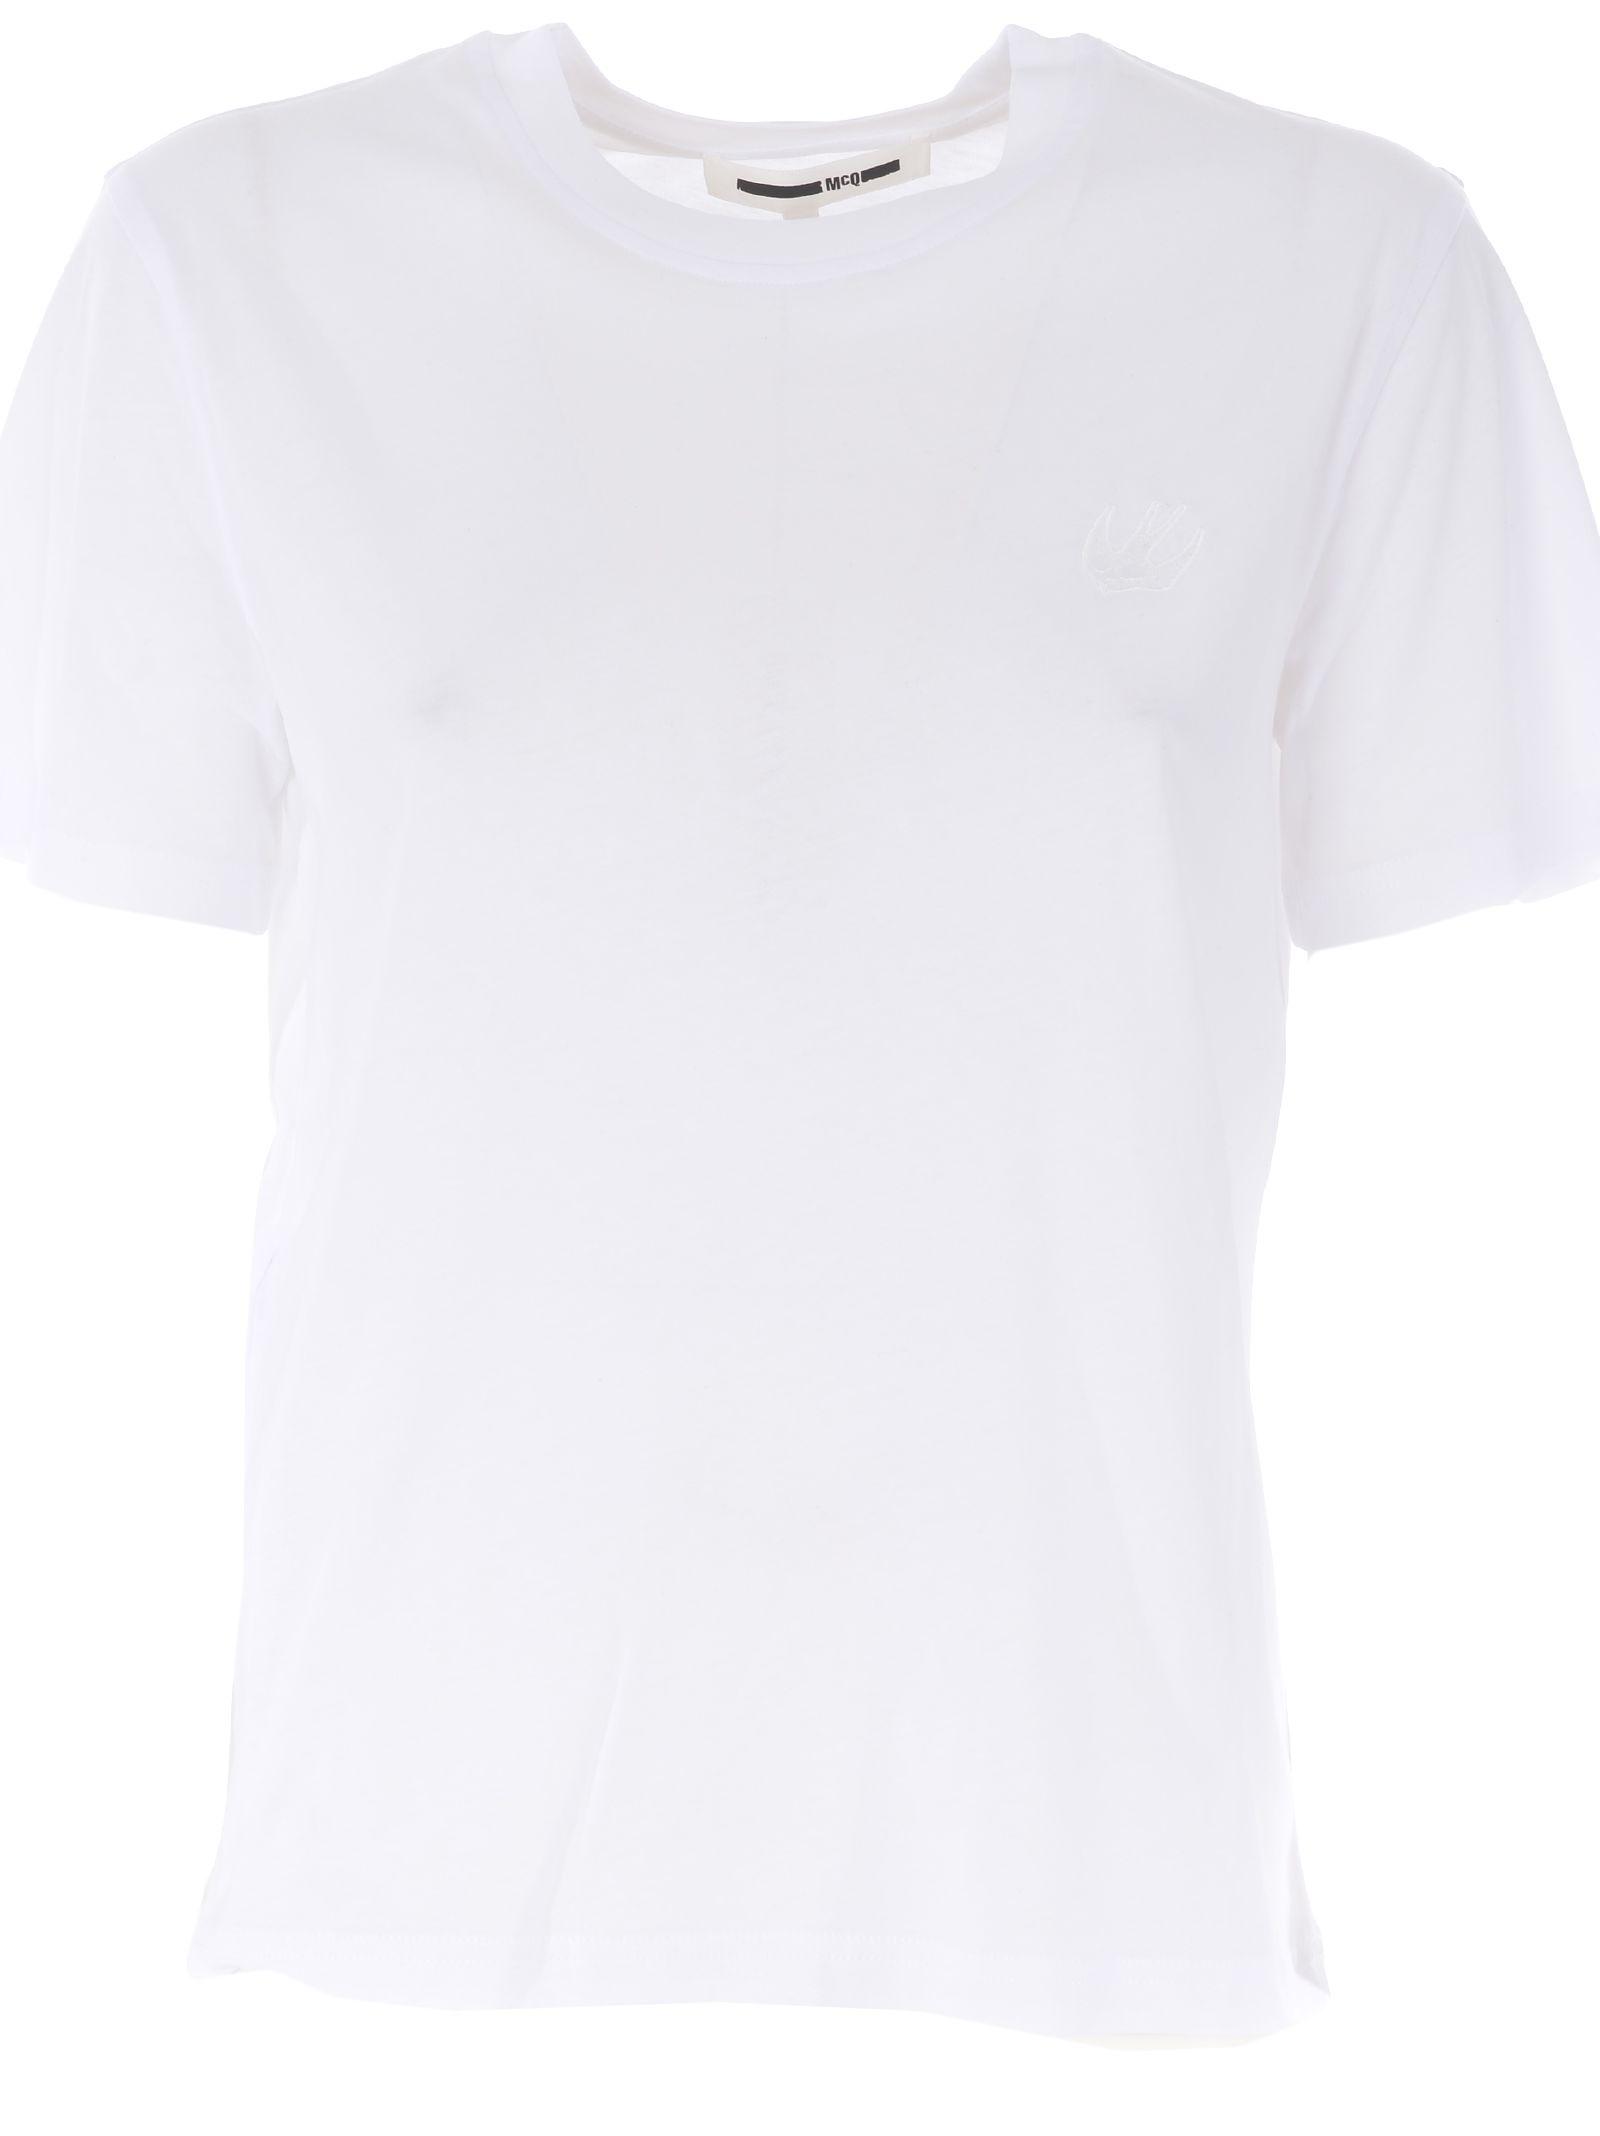 Mcq Alexander Mcqueen Embroidered Swallow T-shirt